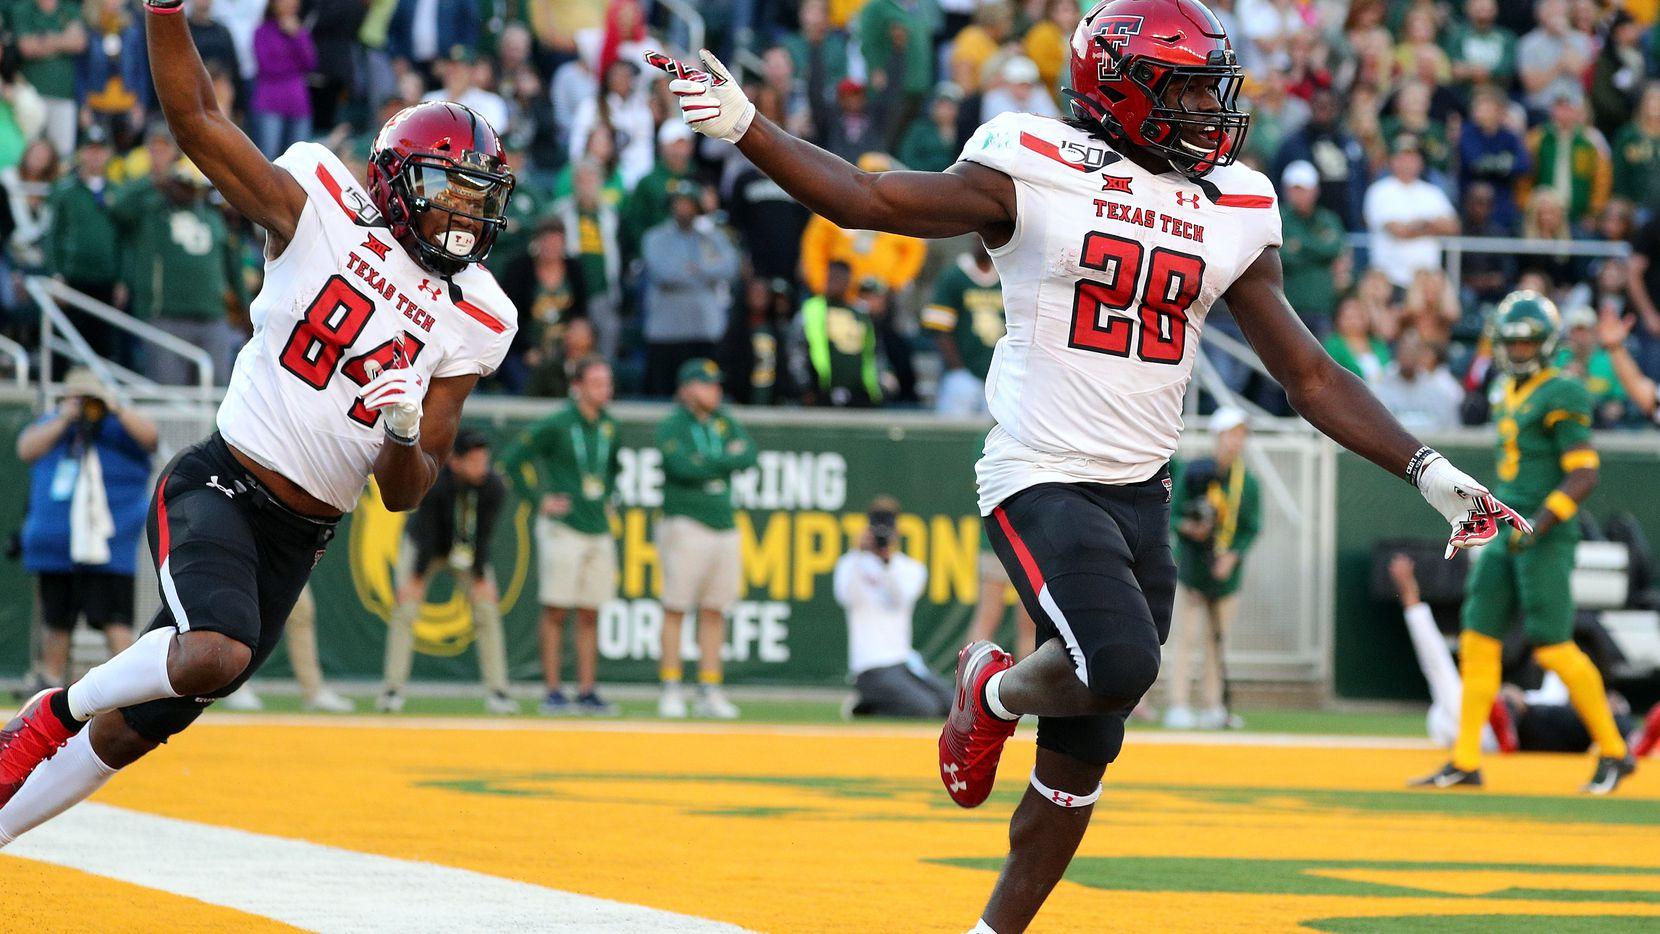 WACO, TEXAS - OCTOBER 12: Erik Ezukanma #84 and SaRodorick Thompson #28 of the Texas Tech Red Raiders celebrate a fourth-quarter touchdown against the Baylor Bears on October 12, 2019 in Waco, Texas.